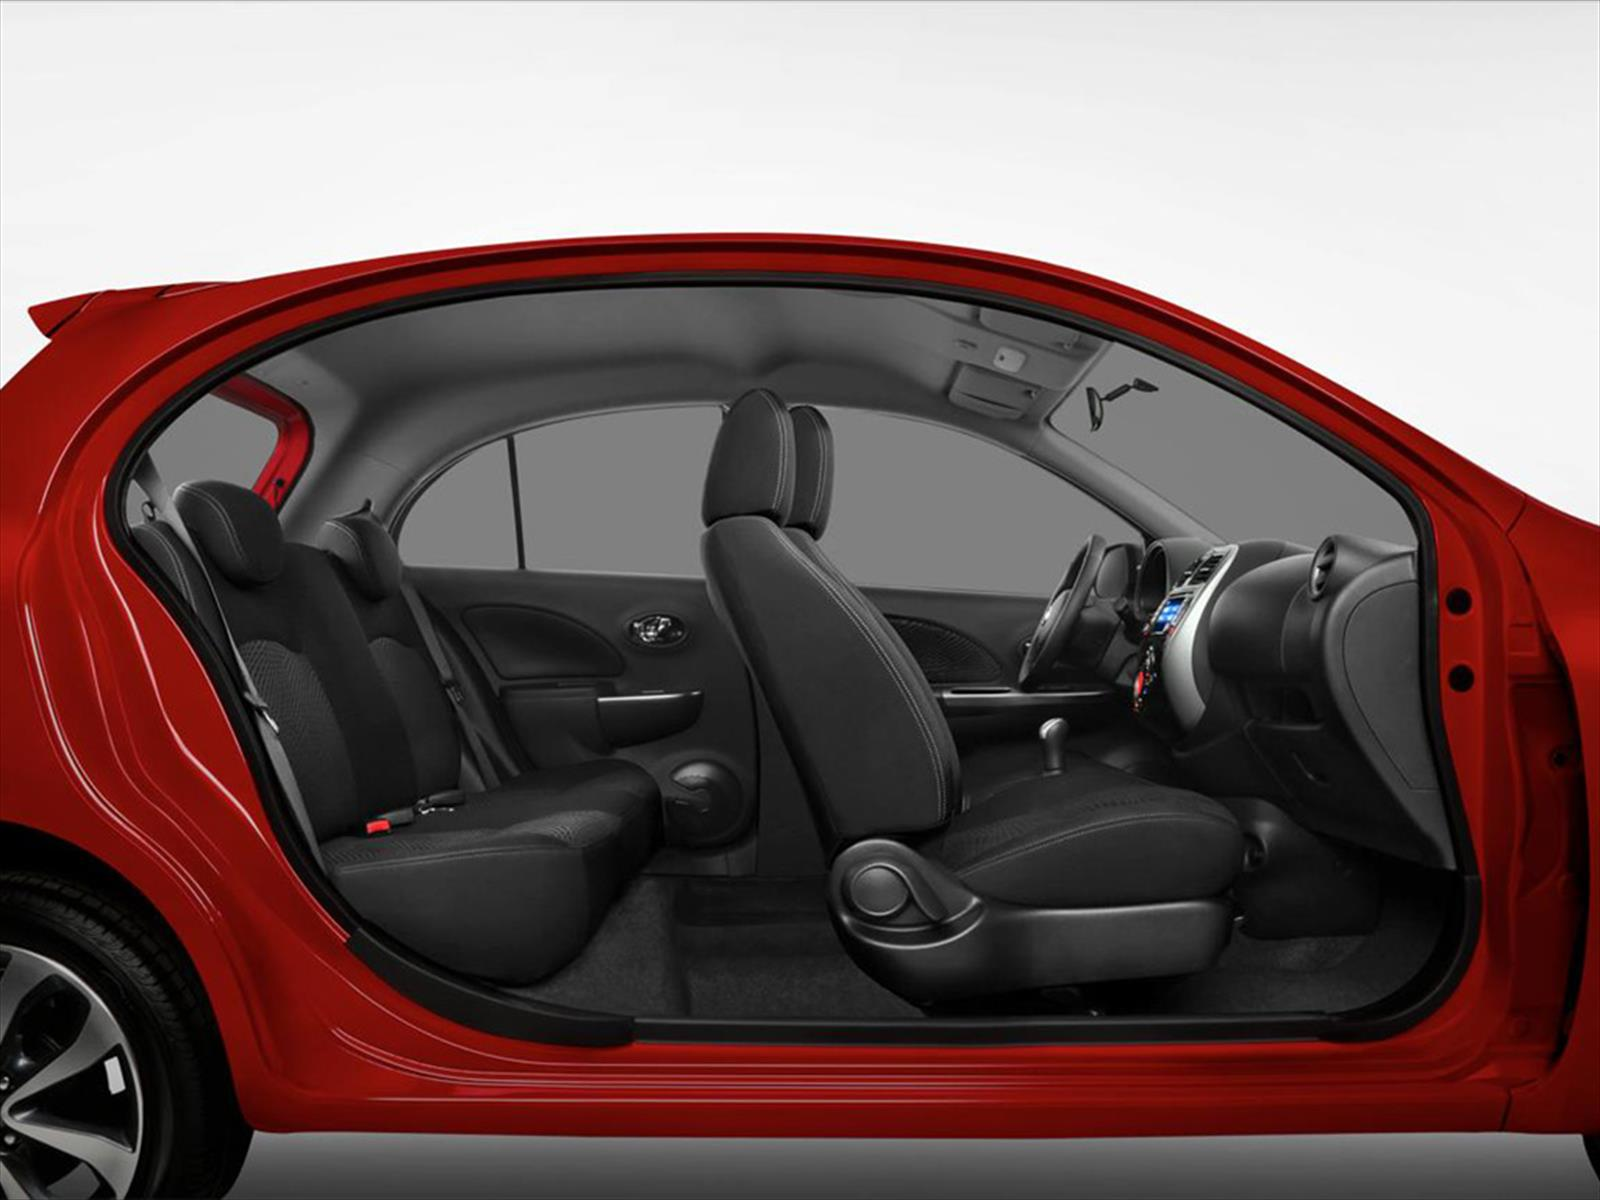 Nissan March 2014 se presenta en México desde $150,400 pesos